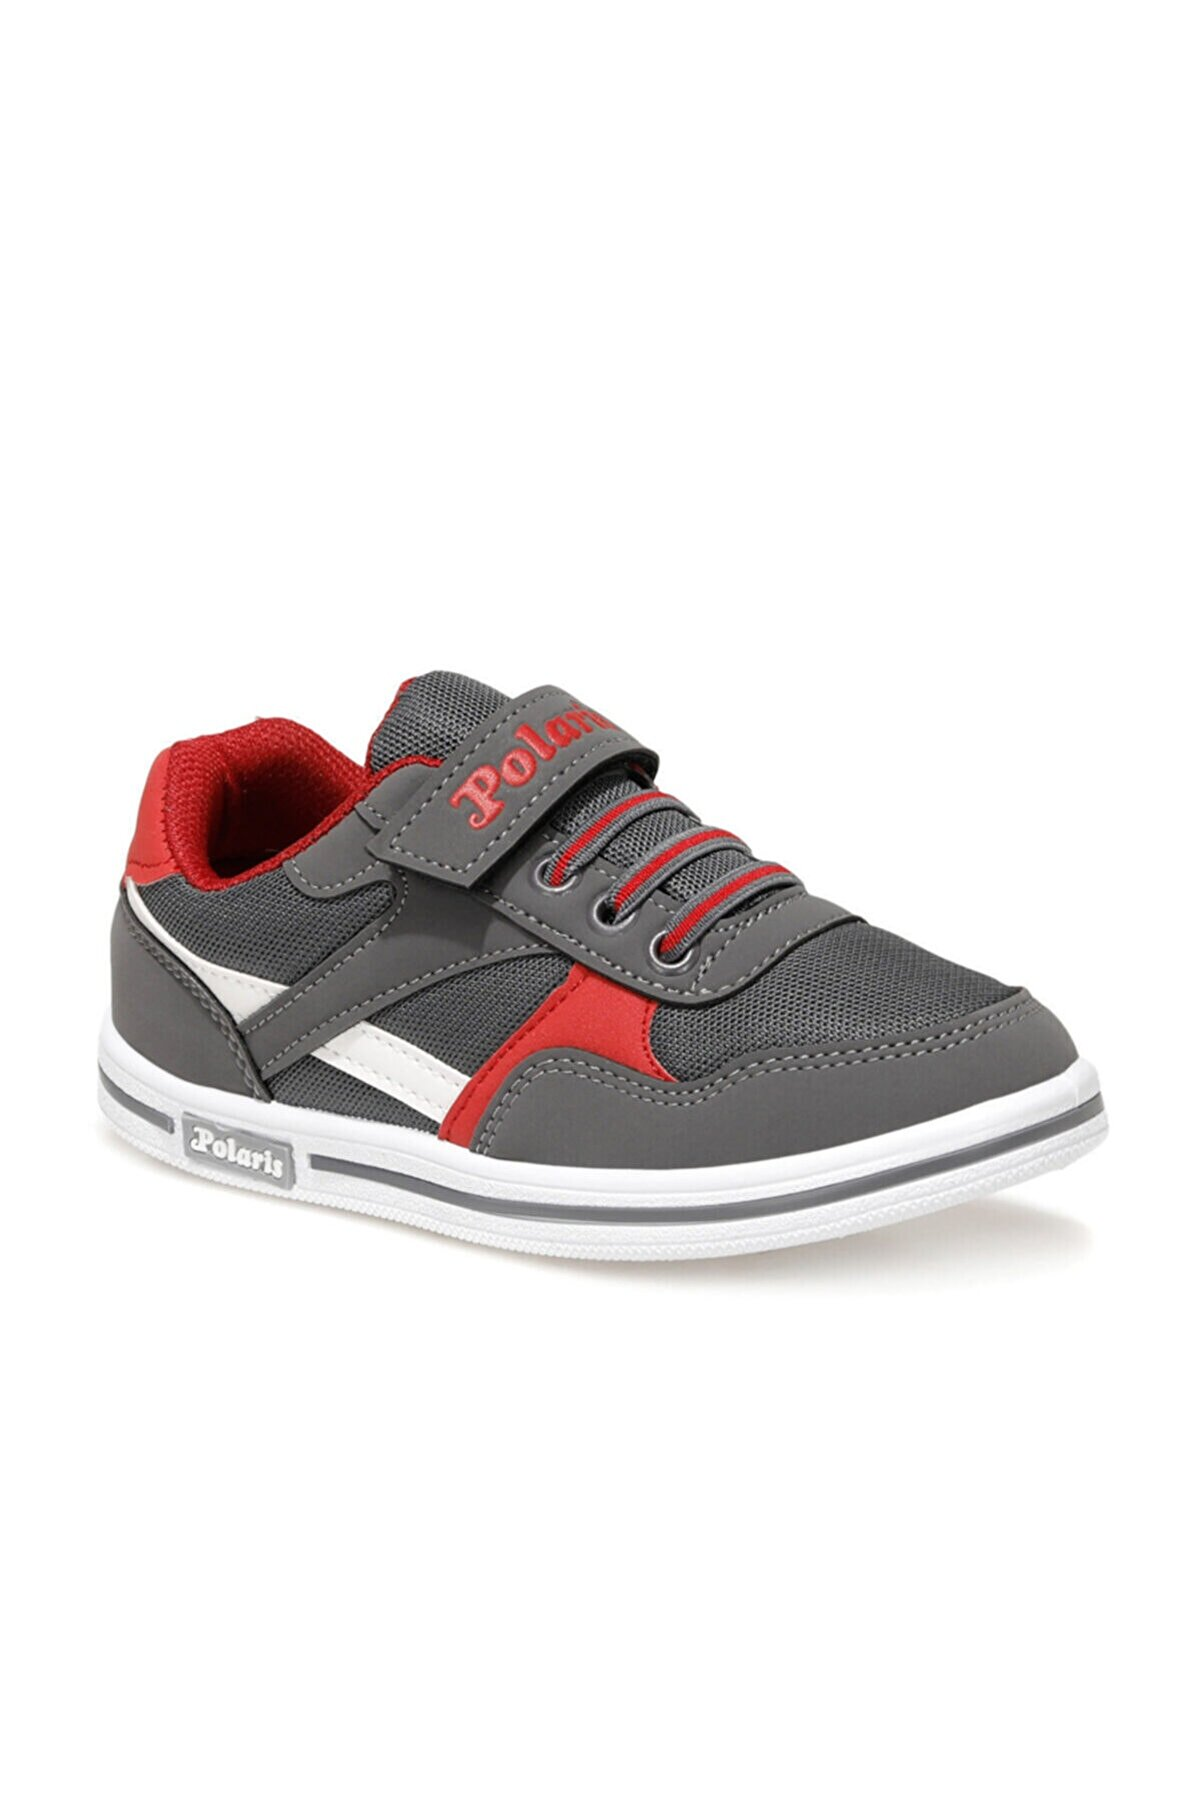 Polaris 510880.F1FX Gri Erkek Çocuk Sneaker 100787983